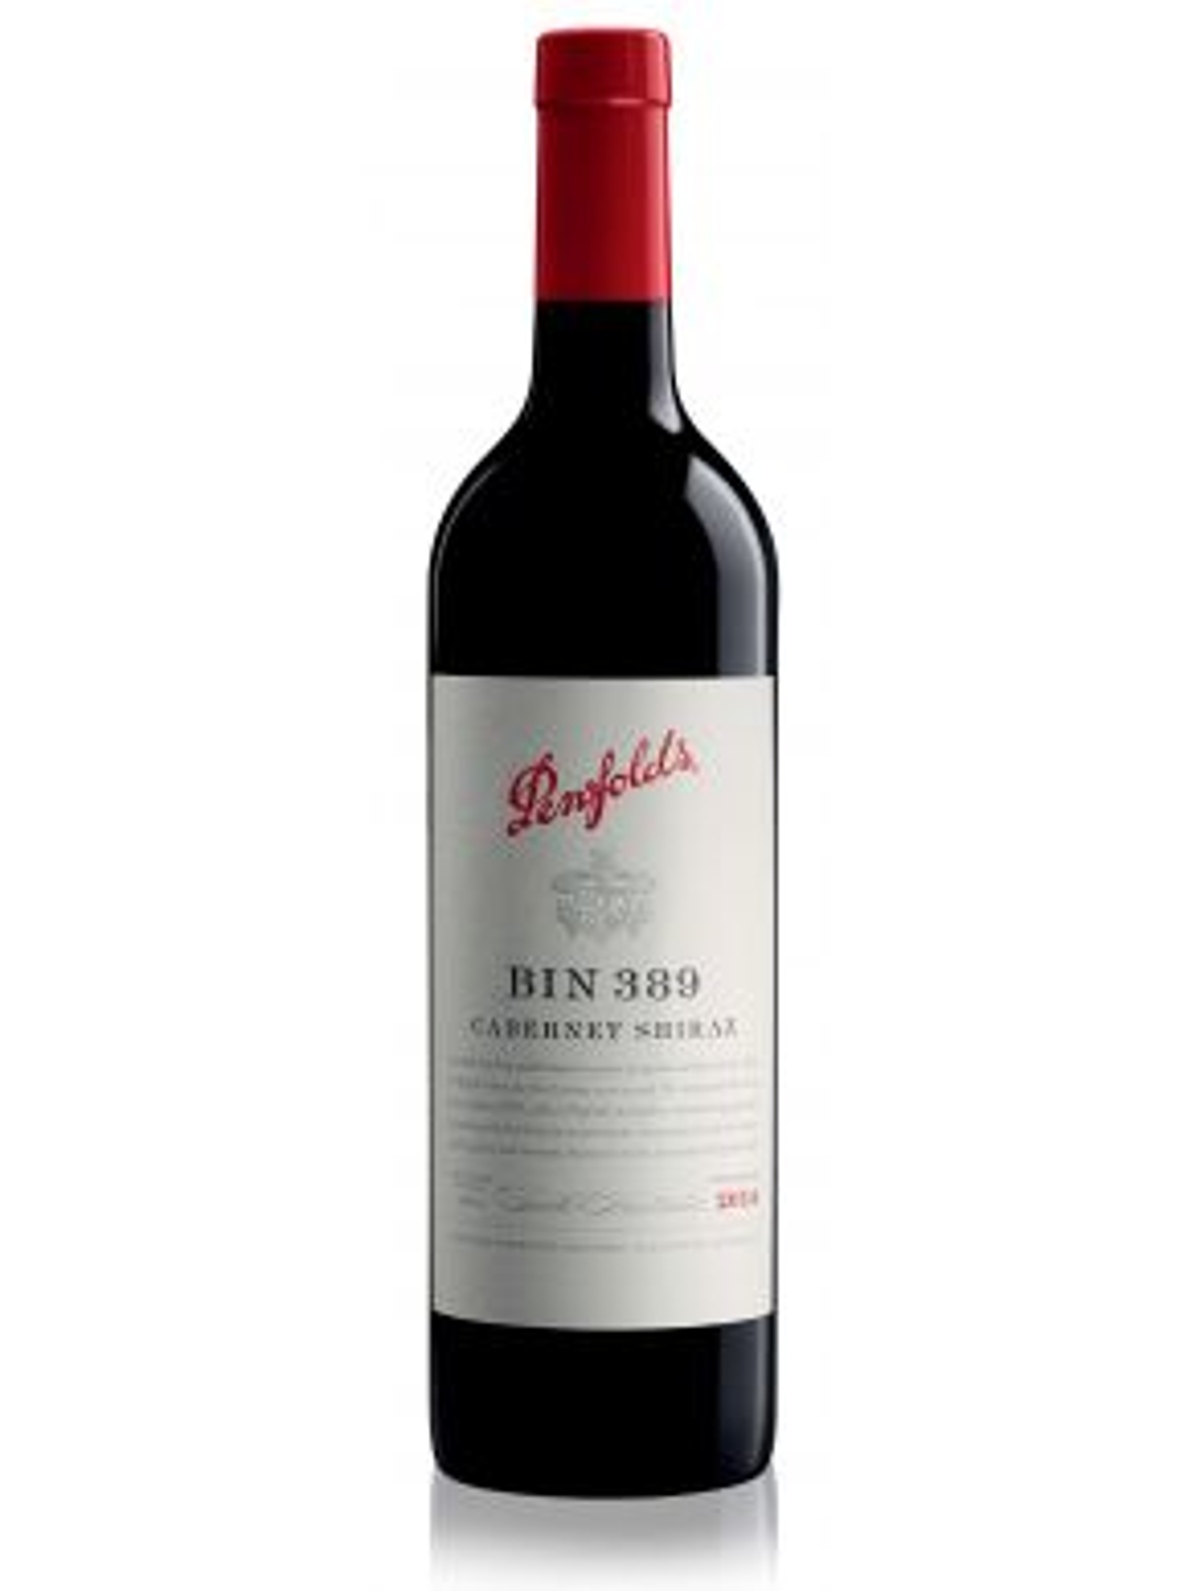 Penfolds Bin 389 Coonawarra Cabernet Shiraz Red Wine 2014 75cl